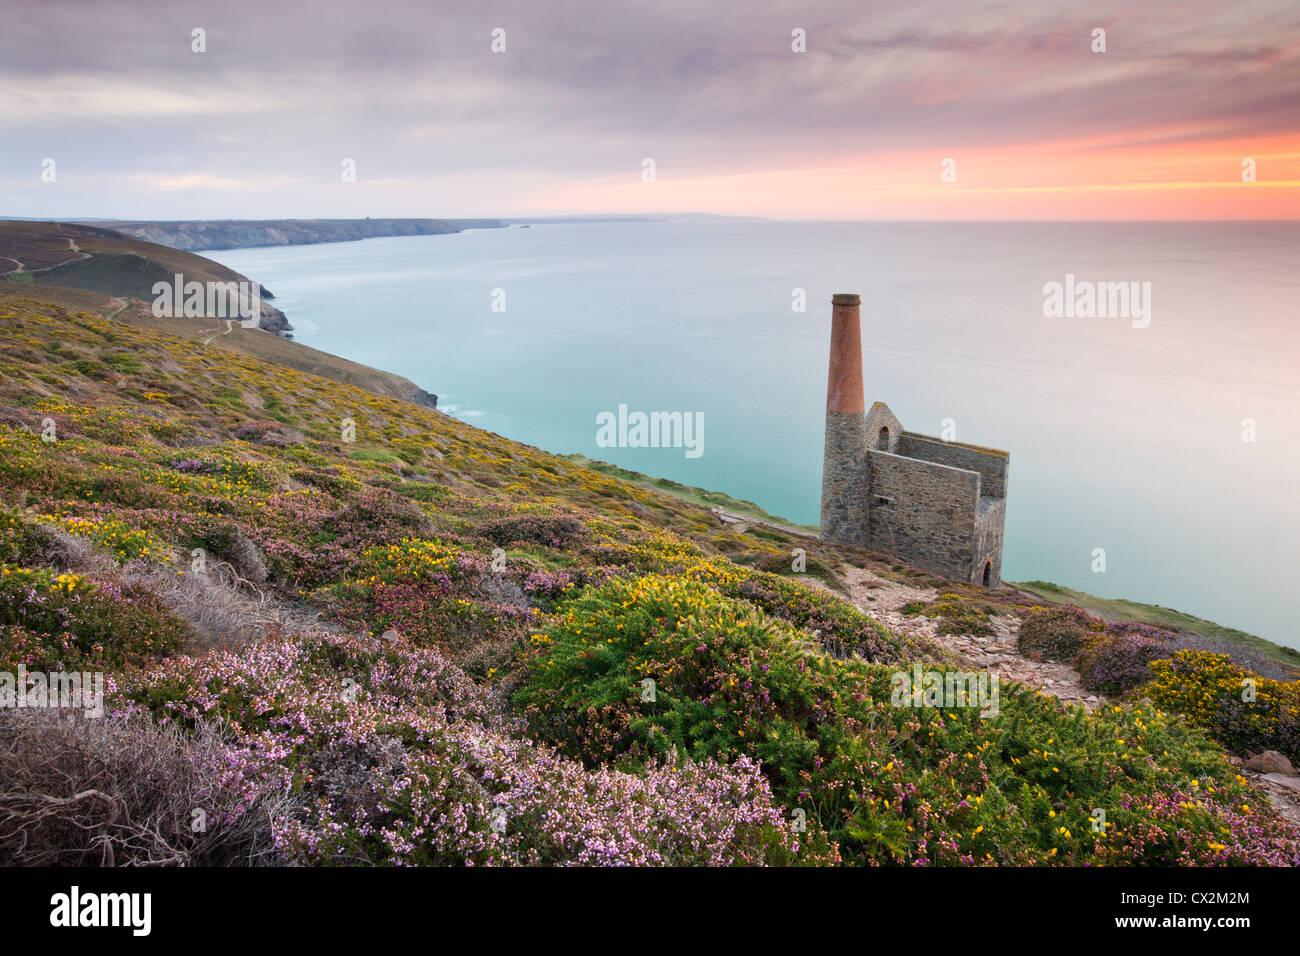 Sunset behind Towanroath Engine House, part of Wheal Coates Tin Mine on the Cornish coast near St Agnes, Cornwall, - Stock Image